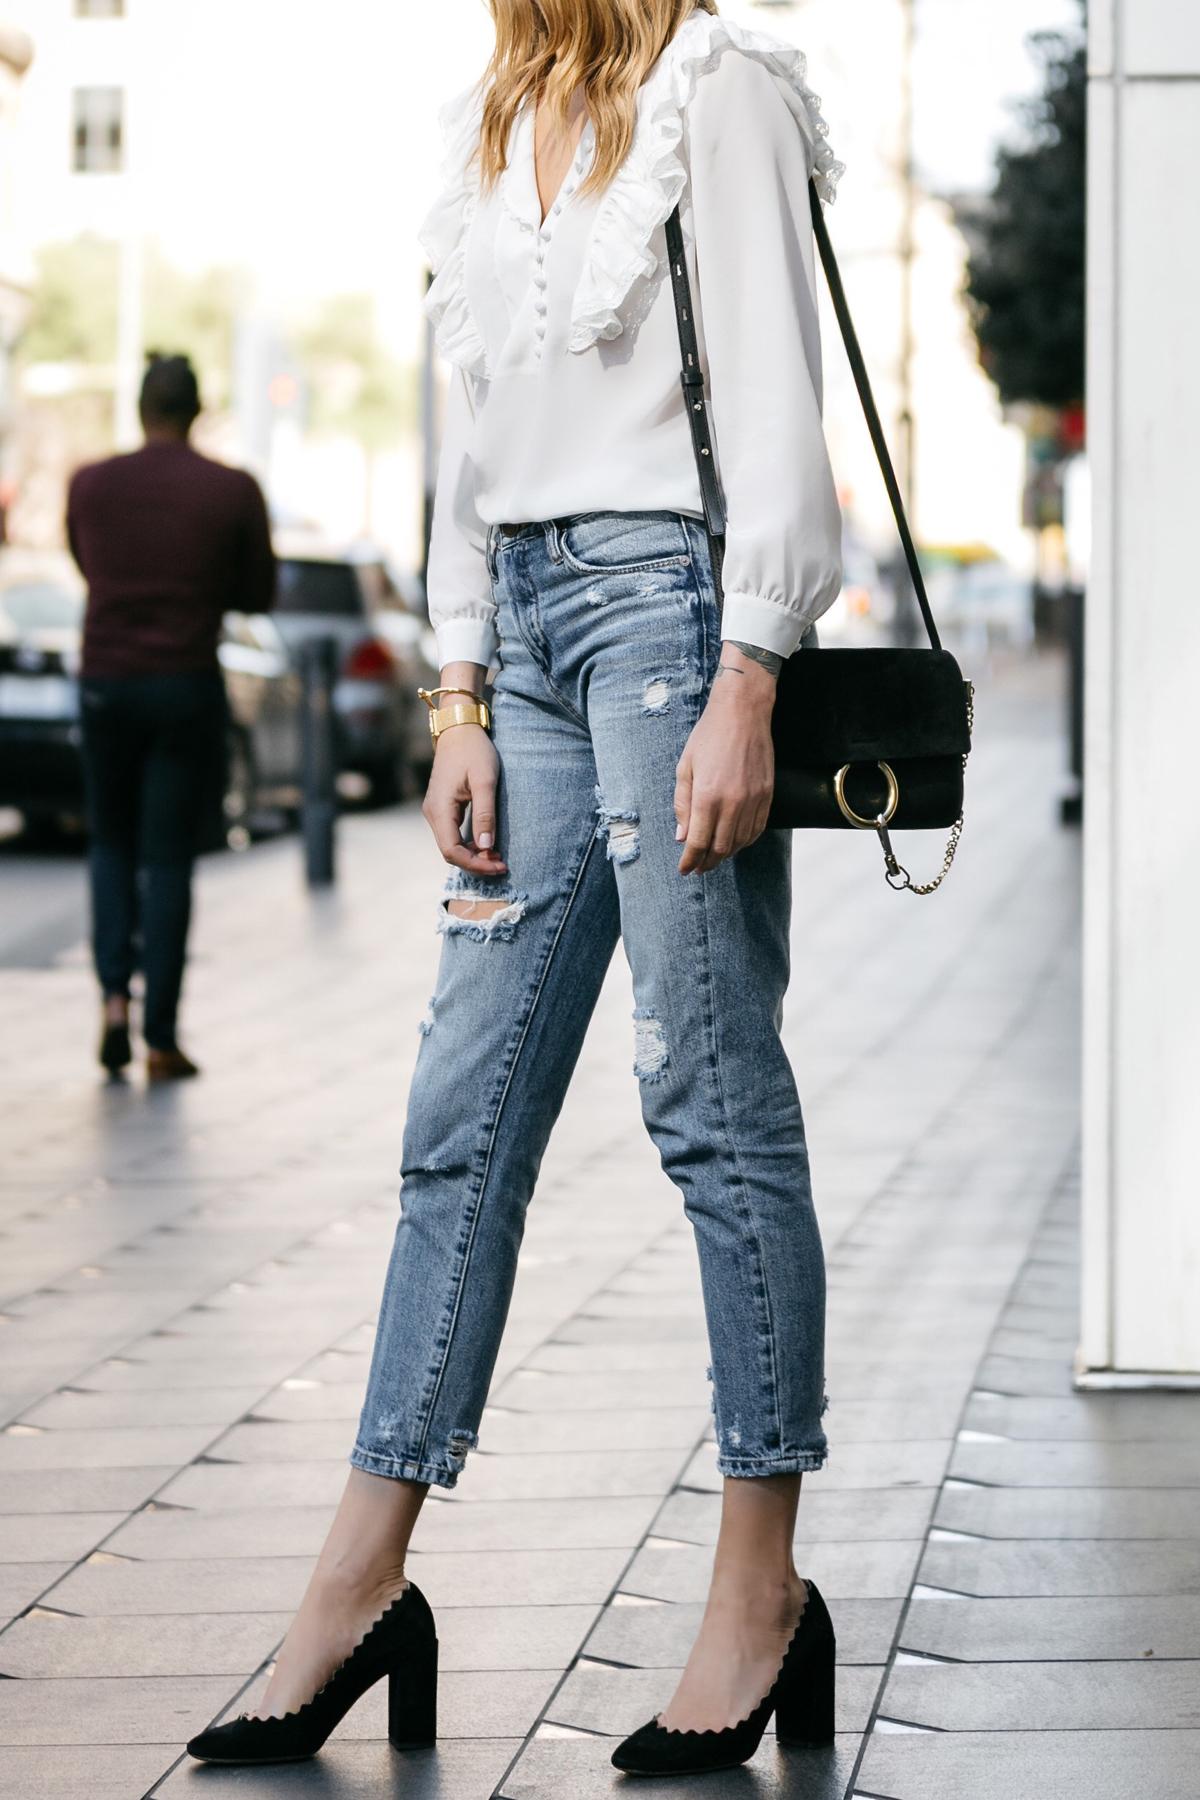 Fashion Jackson, Dallas Blogger, Fashion Blogger, Street Style, Rebecca Taylor White Long Sleeve Silk Ruffle Top, BlankNYC Ripped Denim Mom Jeans, Chloe Lauren Scalloped Pumps, Chloe Faye Handbag